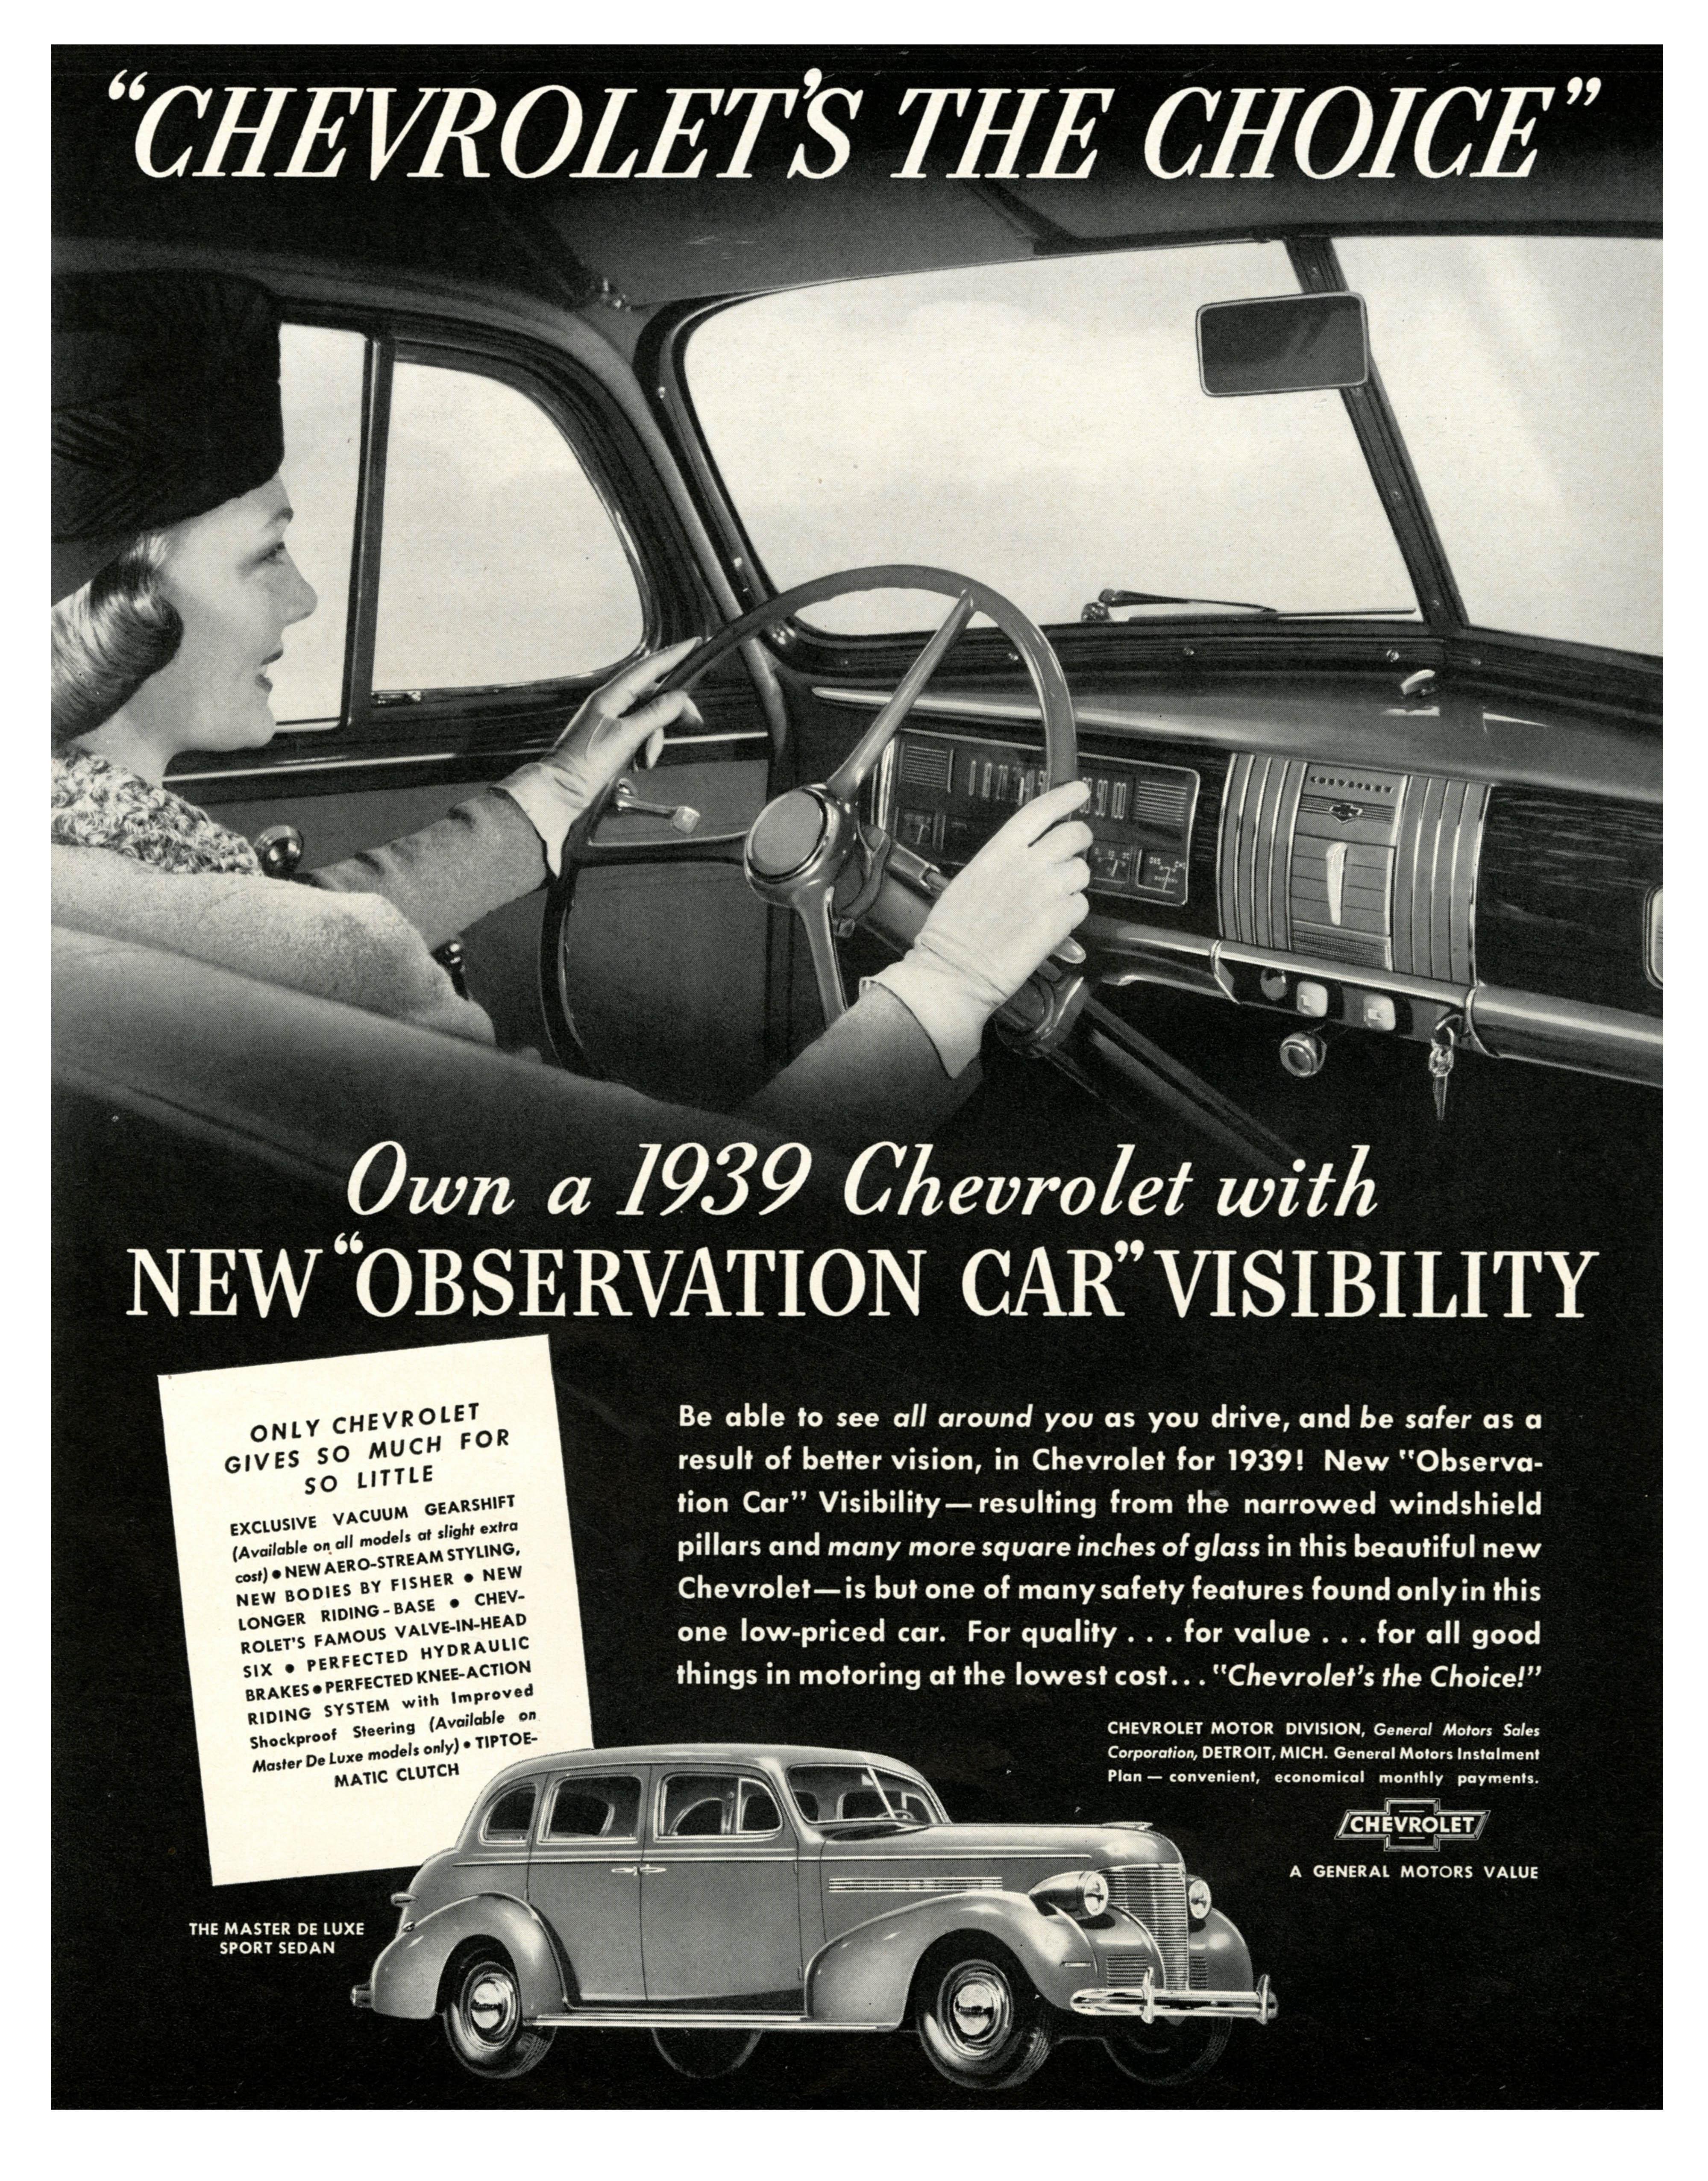 1939 Chevrolet Master De Luxe Sport Sedan